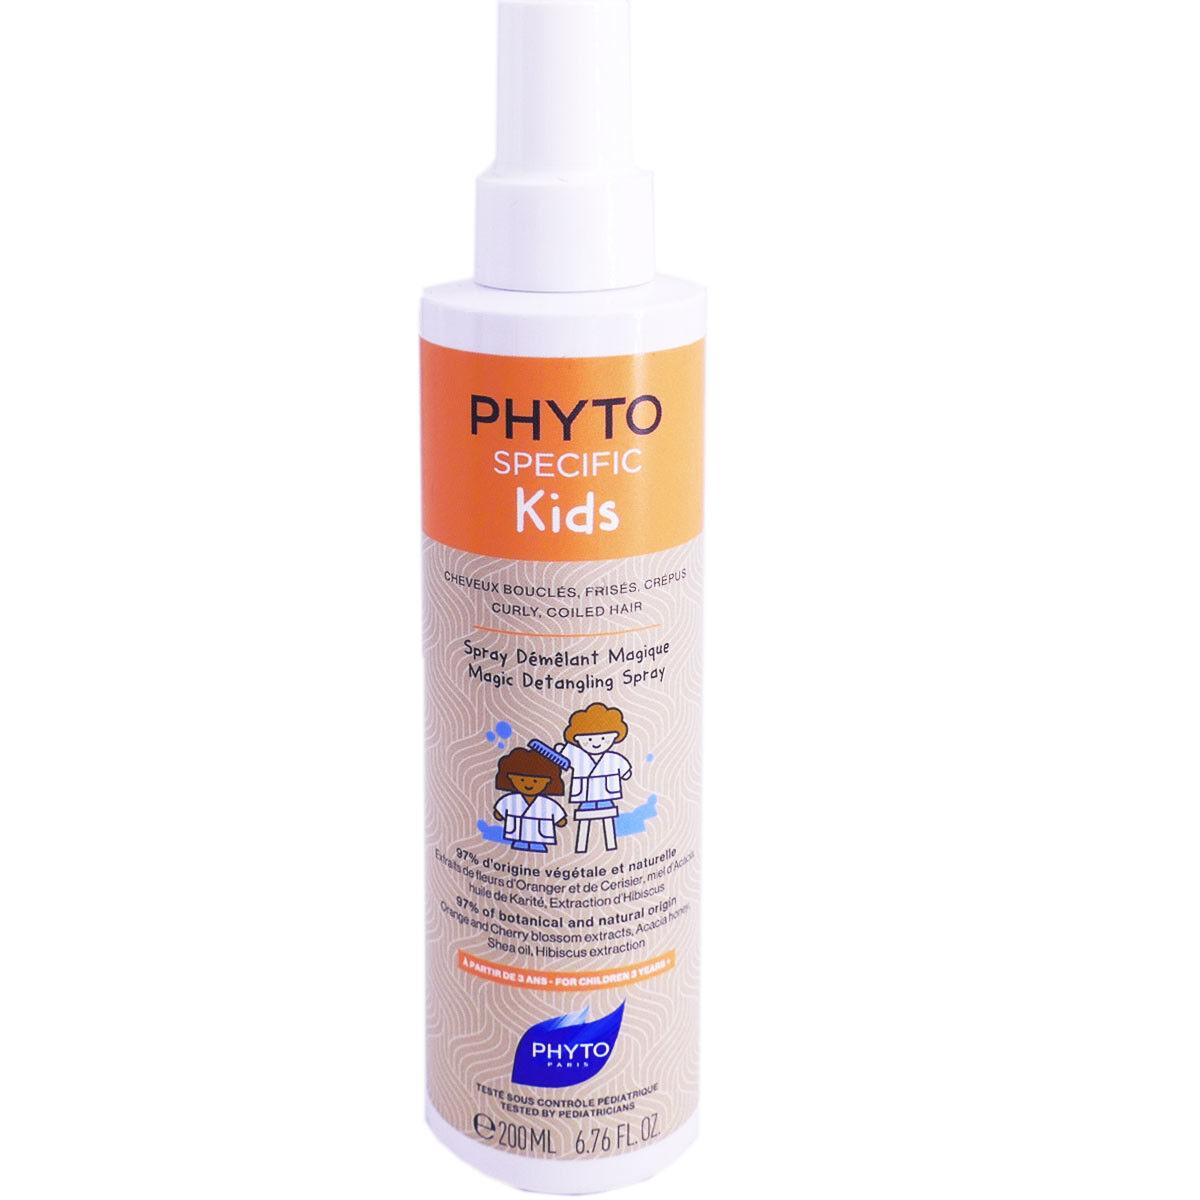 PHYTOSOLBA Phytospecific kids spray demelant magique 200ml